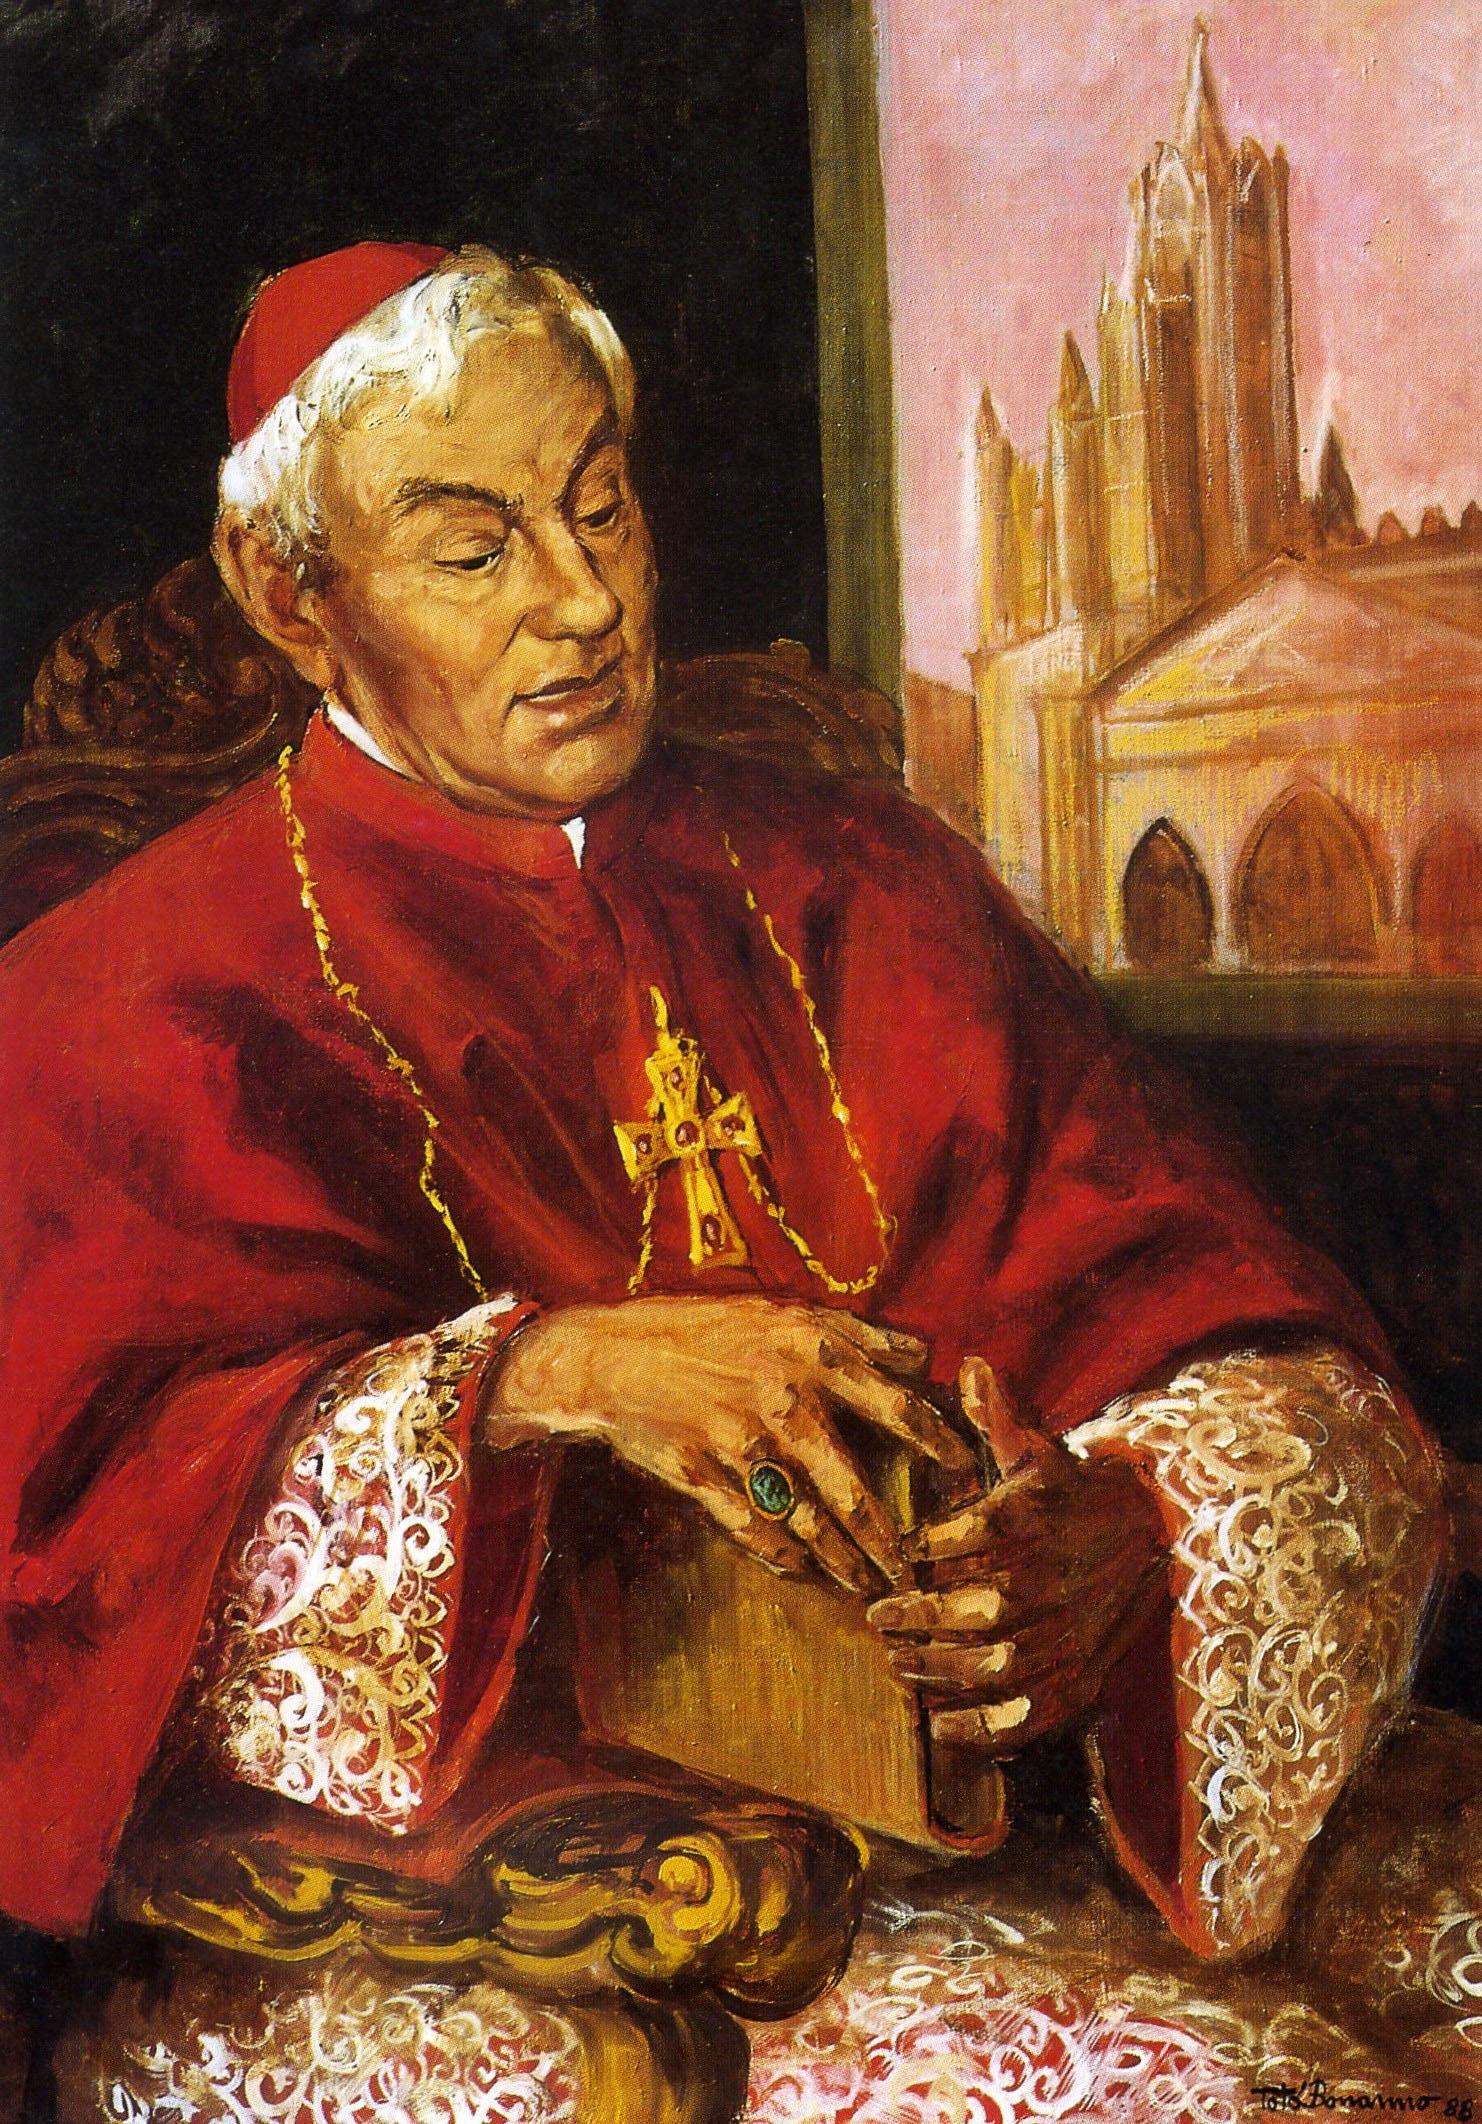 Totò Bonanno - Cardinale Salvatore Pappalardo